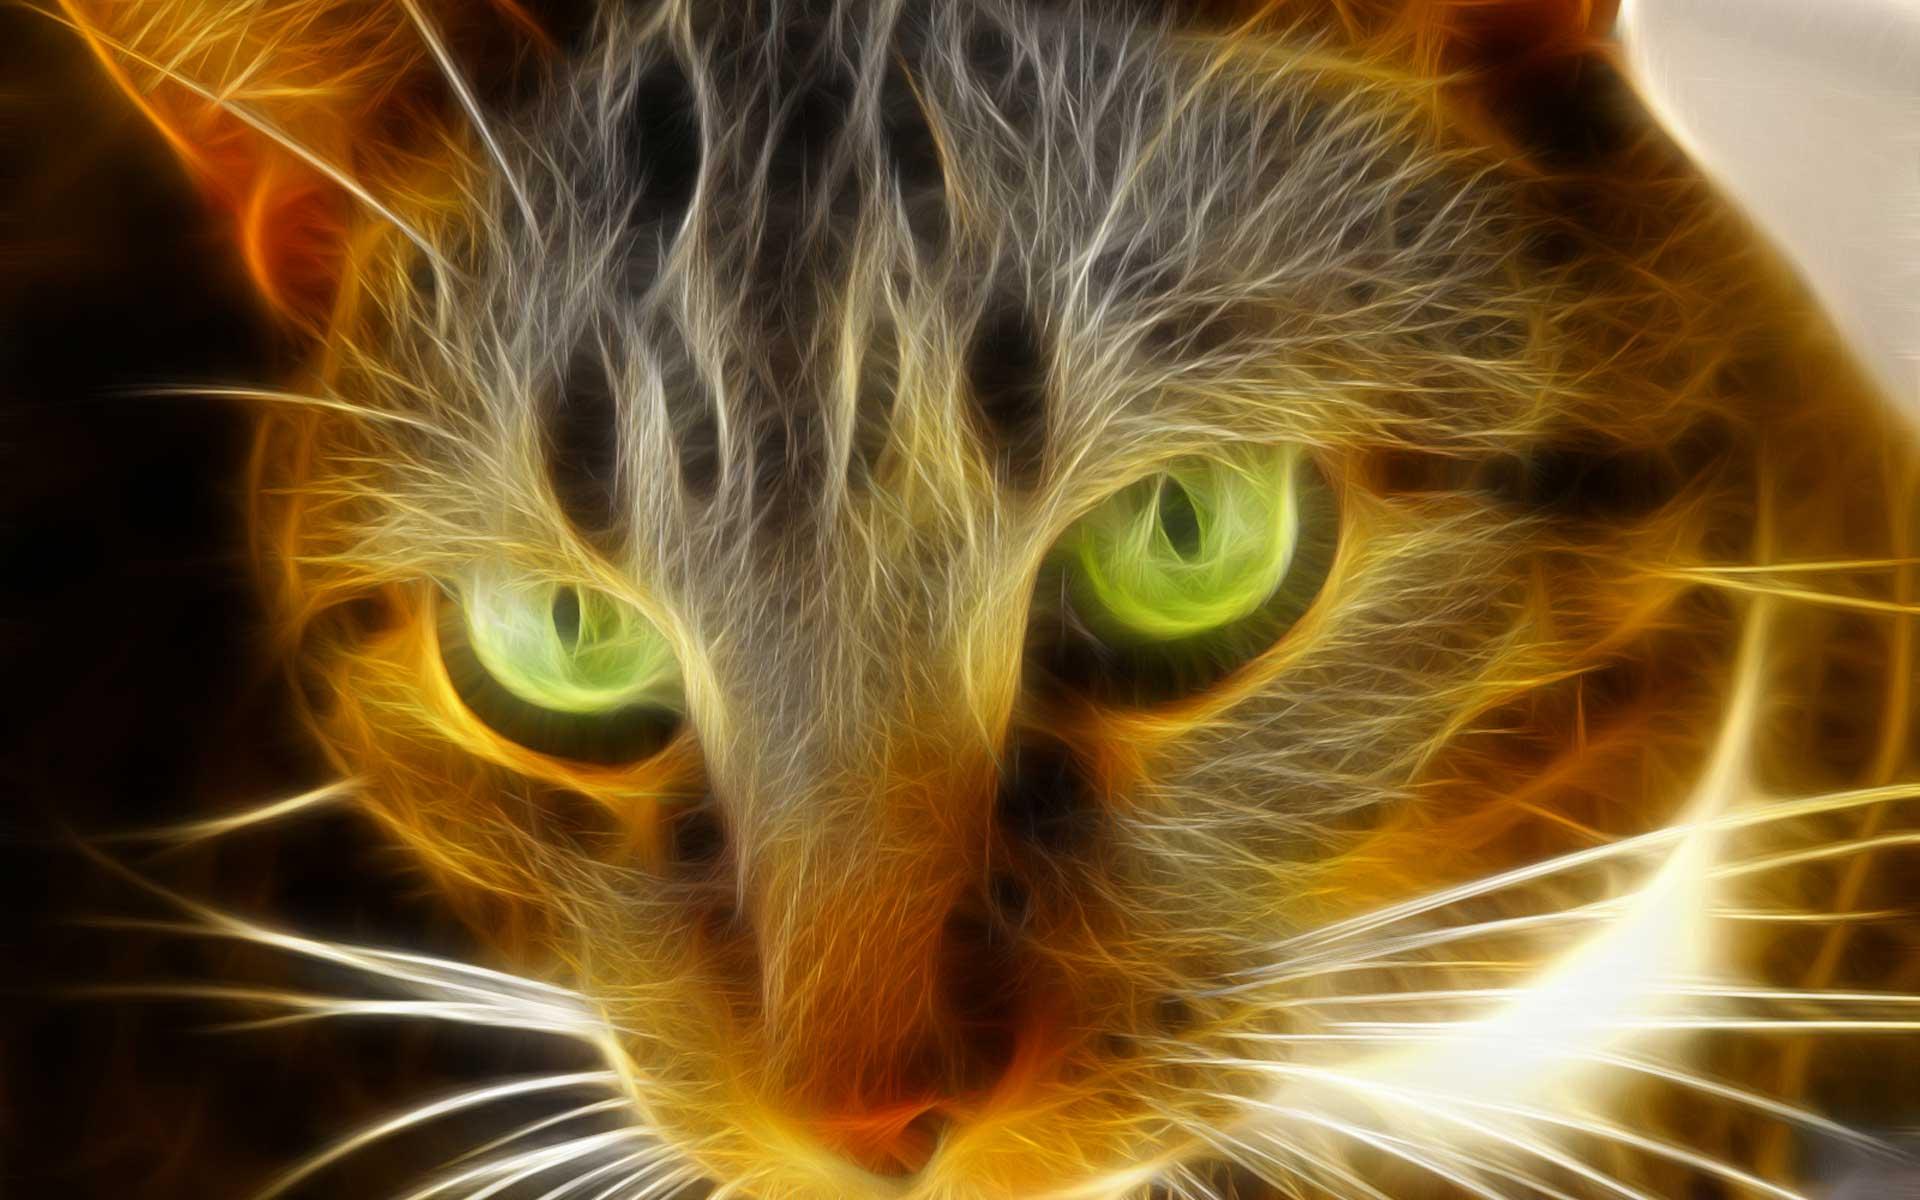 Flaming Cat wallpaper 137185 1920x1200